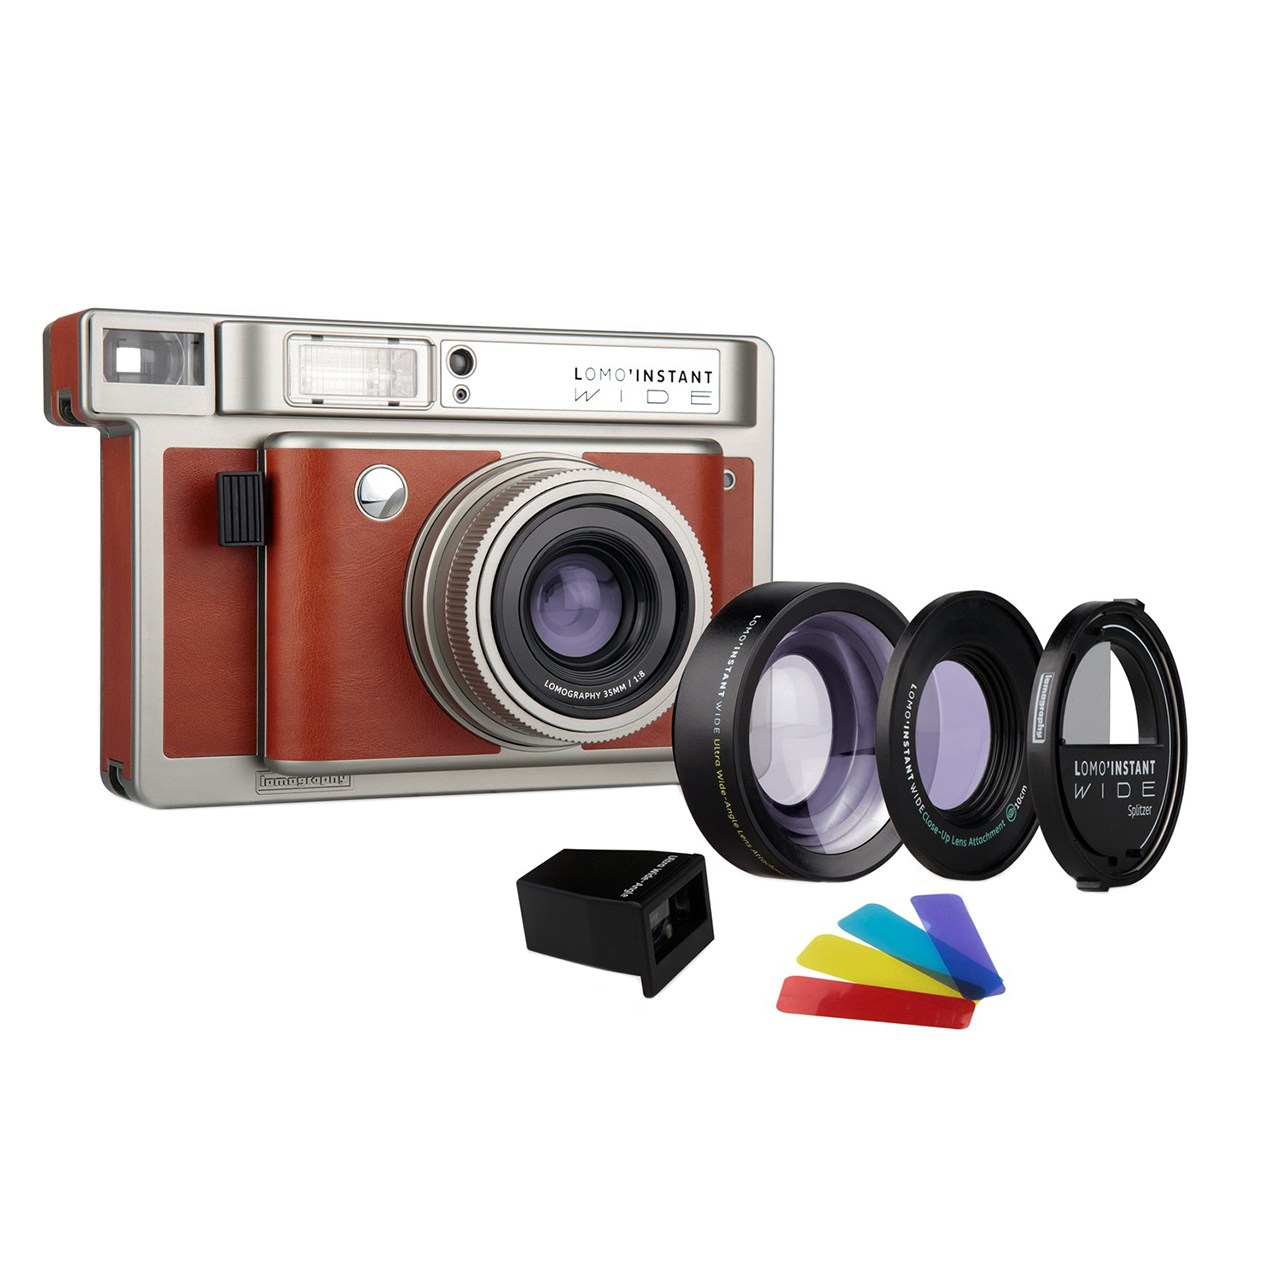 دوربین چاپ سریع لوموگرافی مدل Wide Central Park به همراه دو لنز